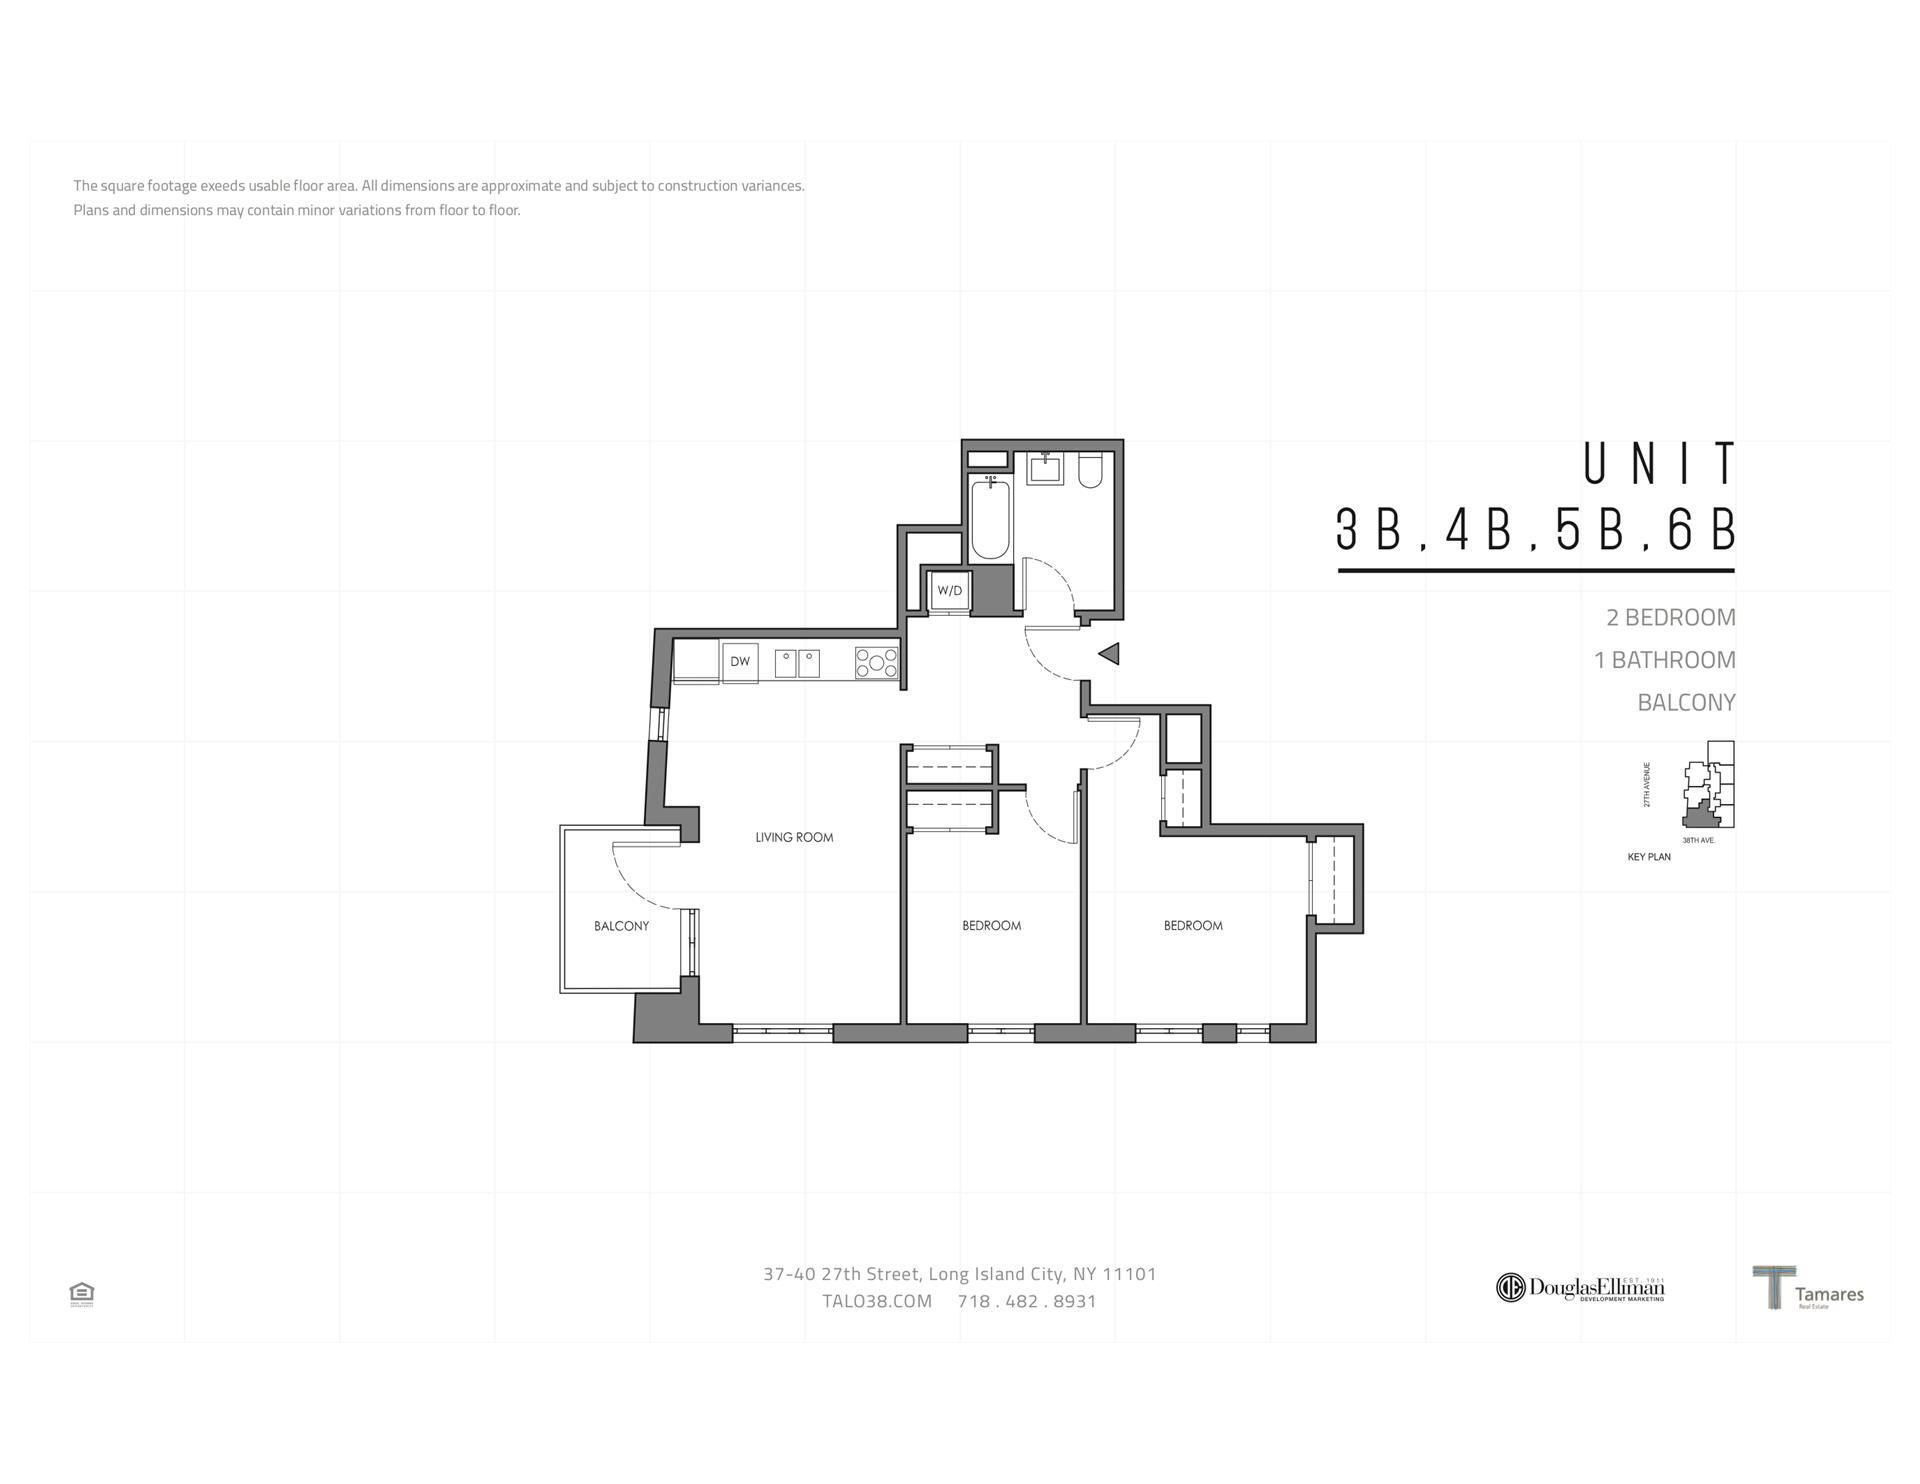 Floor plan of 37-40 27th St, 5B - Long Island City, New York